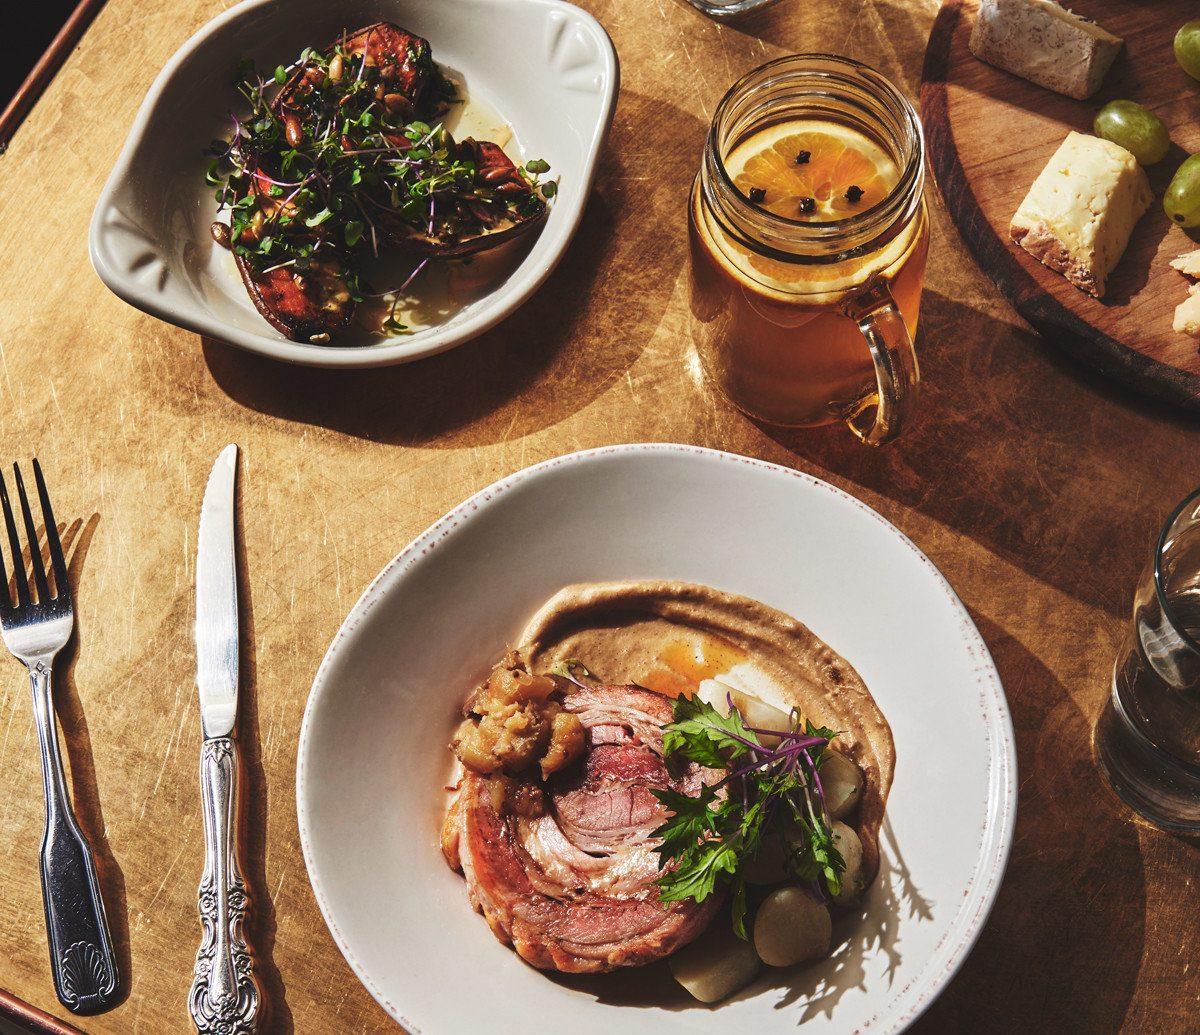 Trip Ideas plate food table dish meal dinner meat restaurant cuisine lunch breakfast supper produce brunch piece de resistance